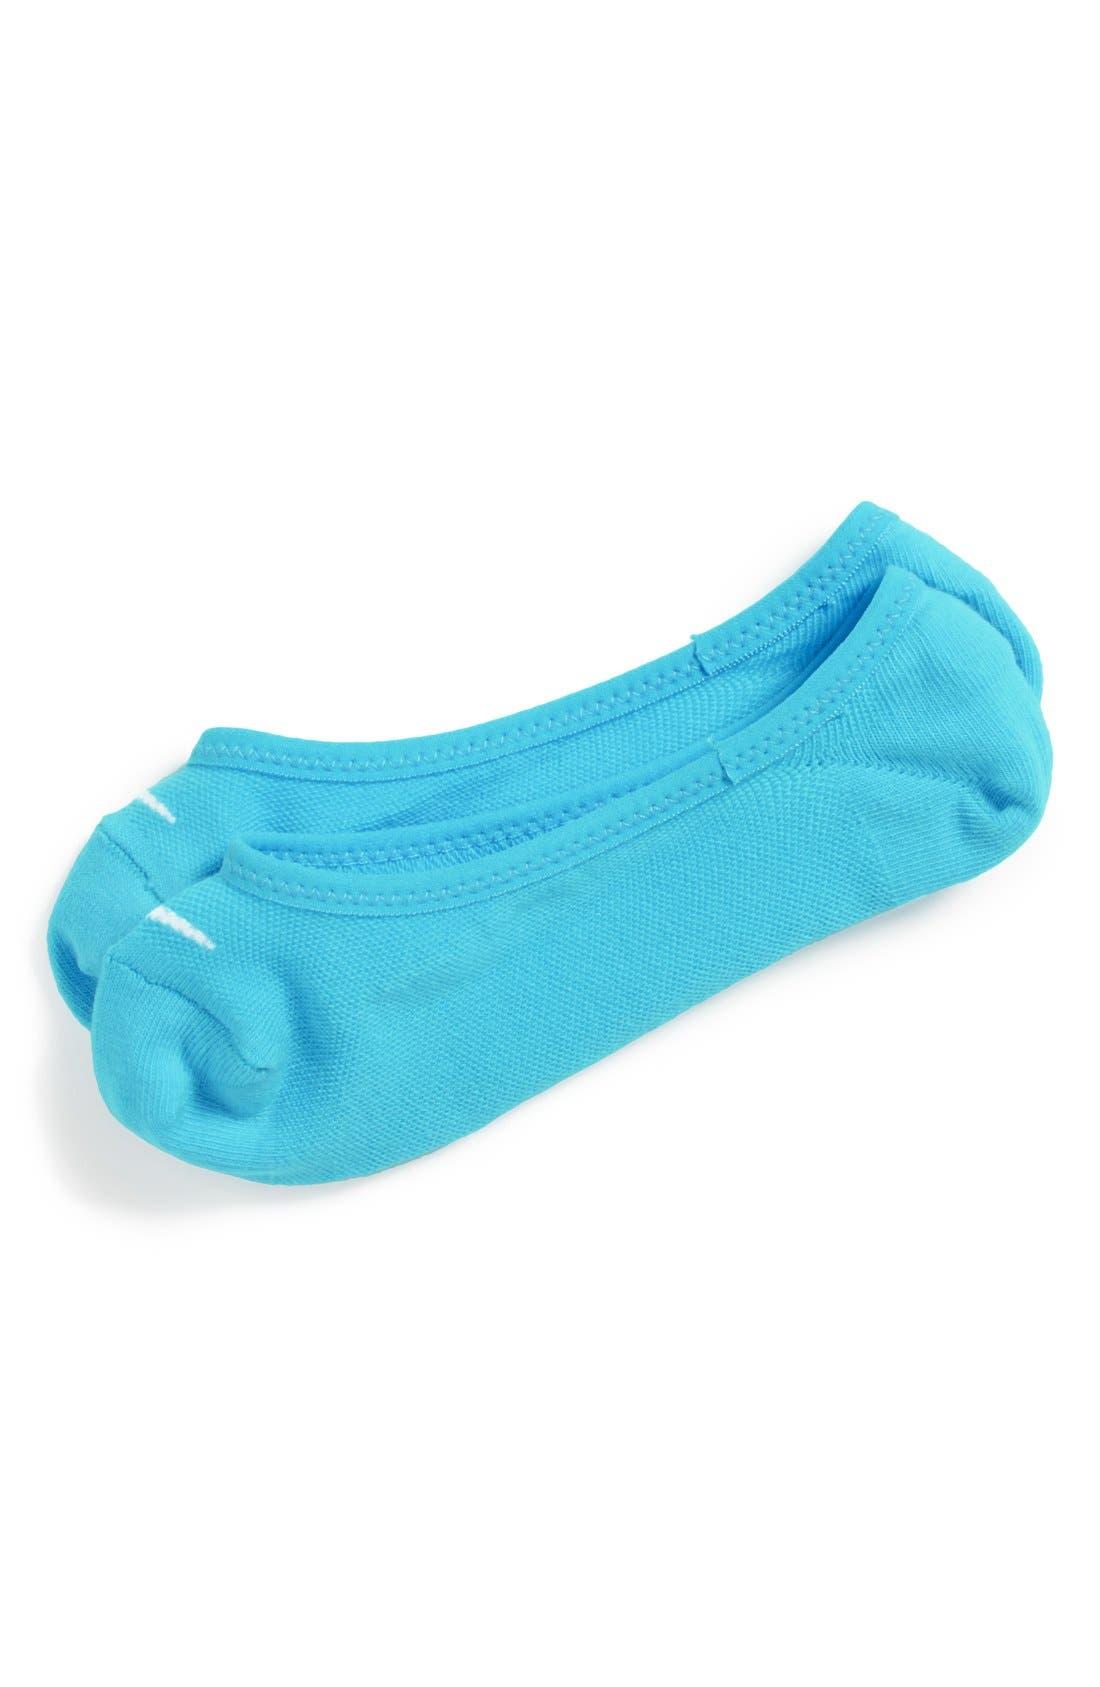 Alternate Image 1 Selected - Nike 'Studio' No-Show Socks (Women)